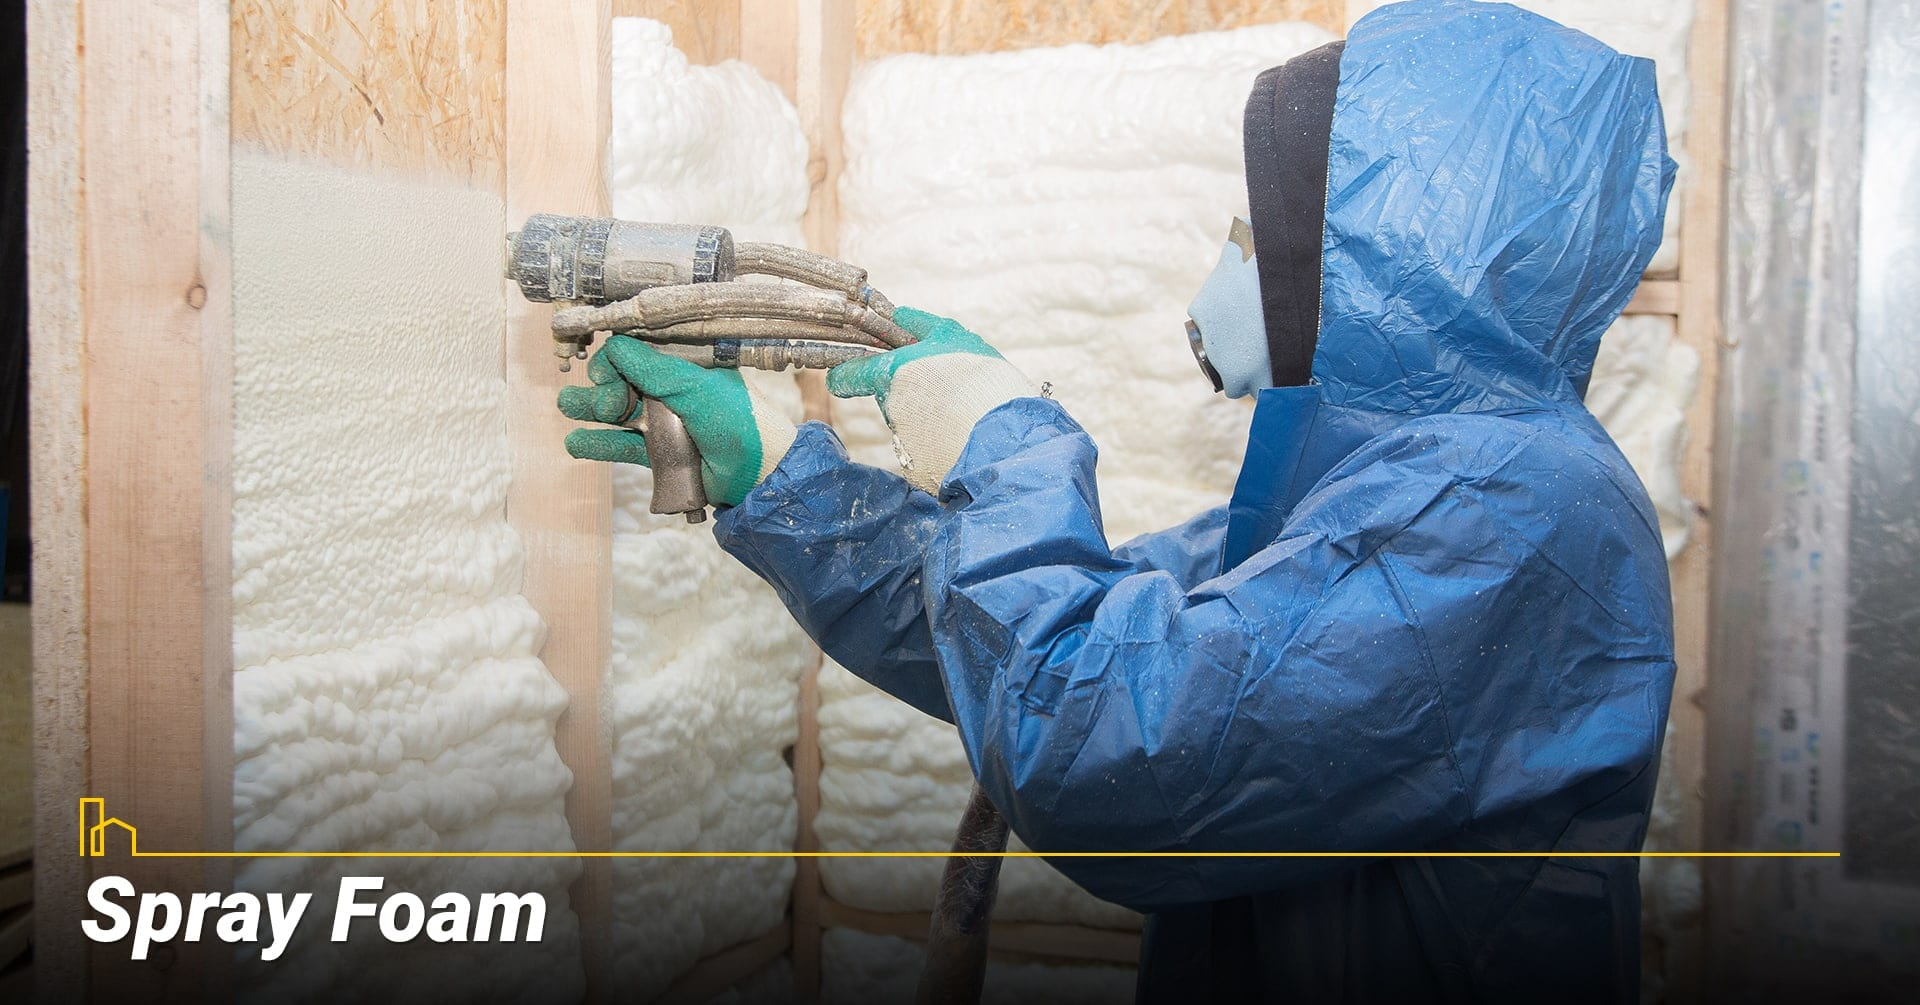 Spray Foam, use spray foam as insulation